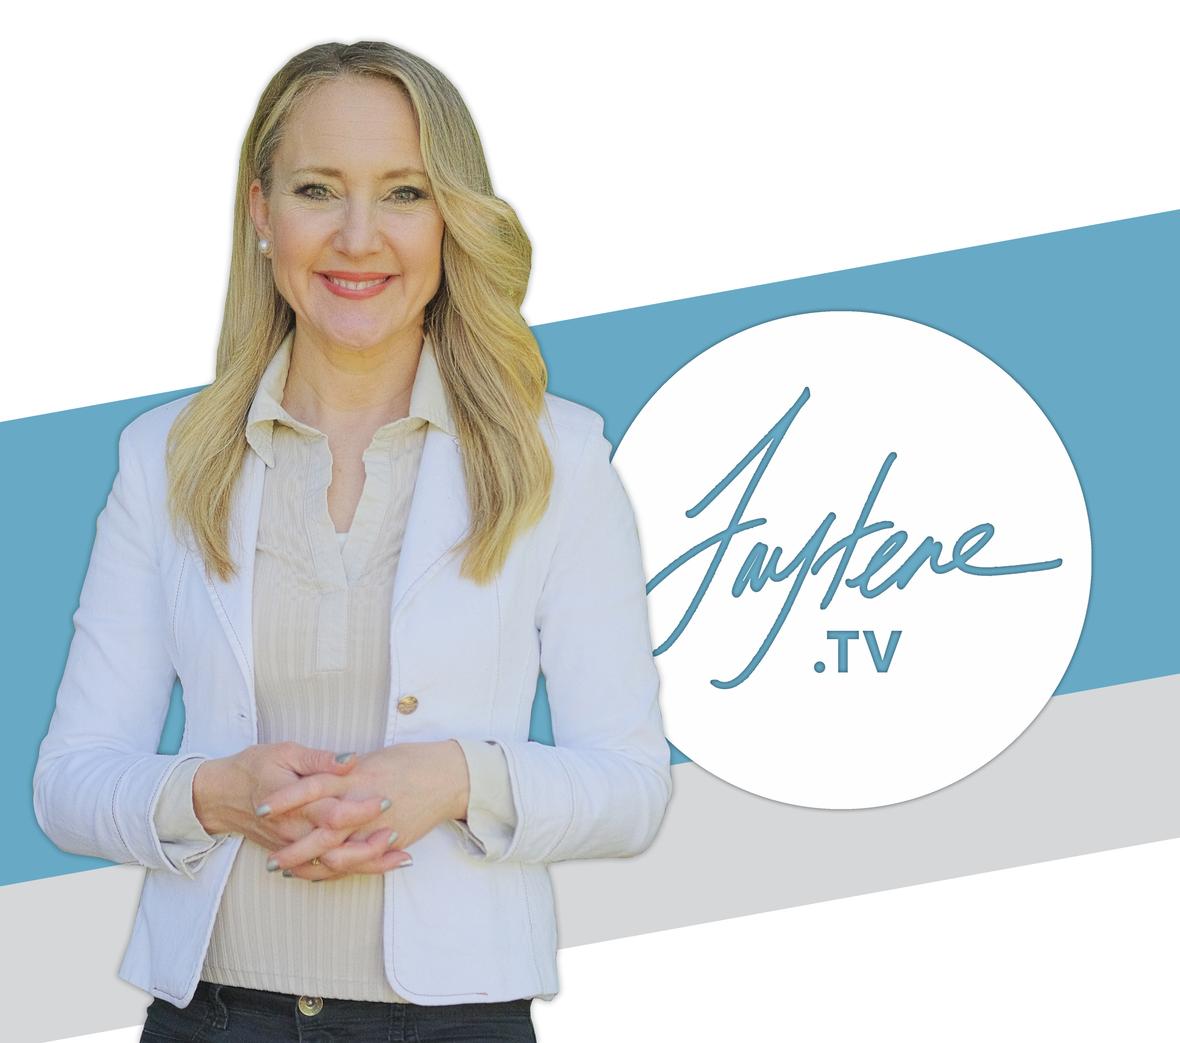 FayteneWhiteJacket2021bluestripePodcast